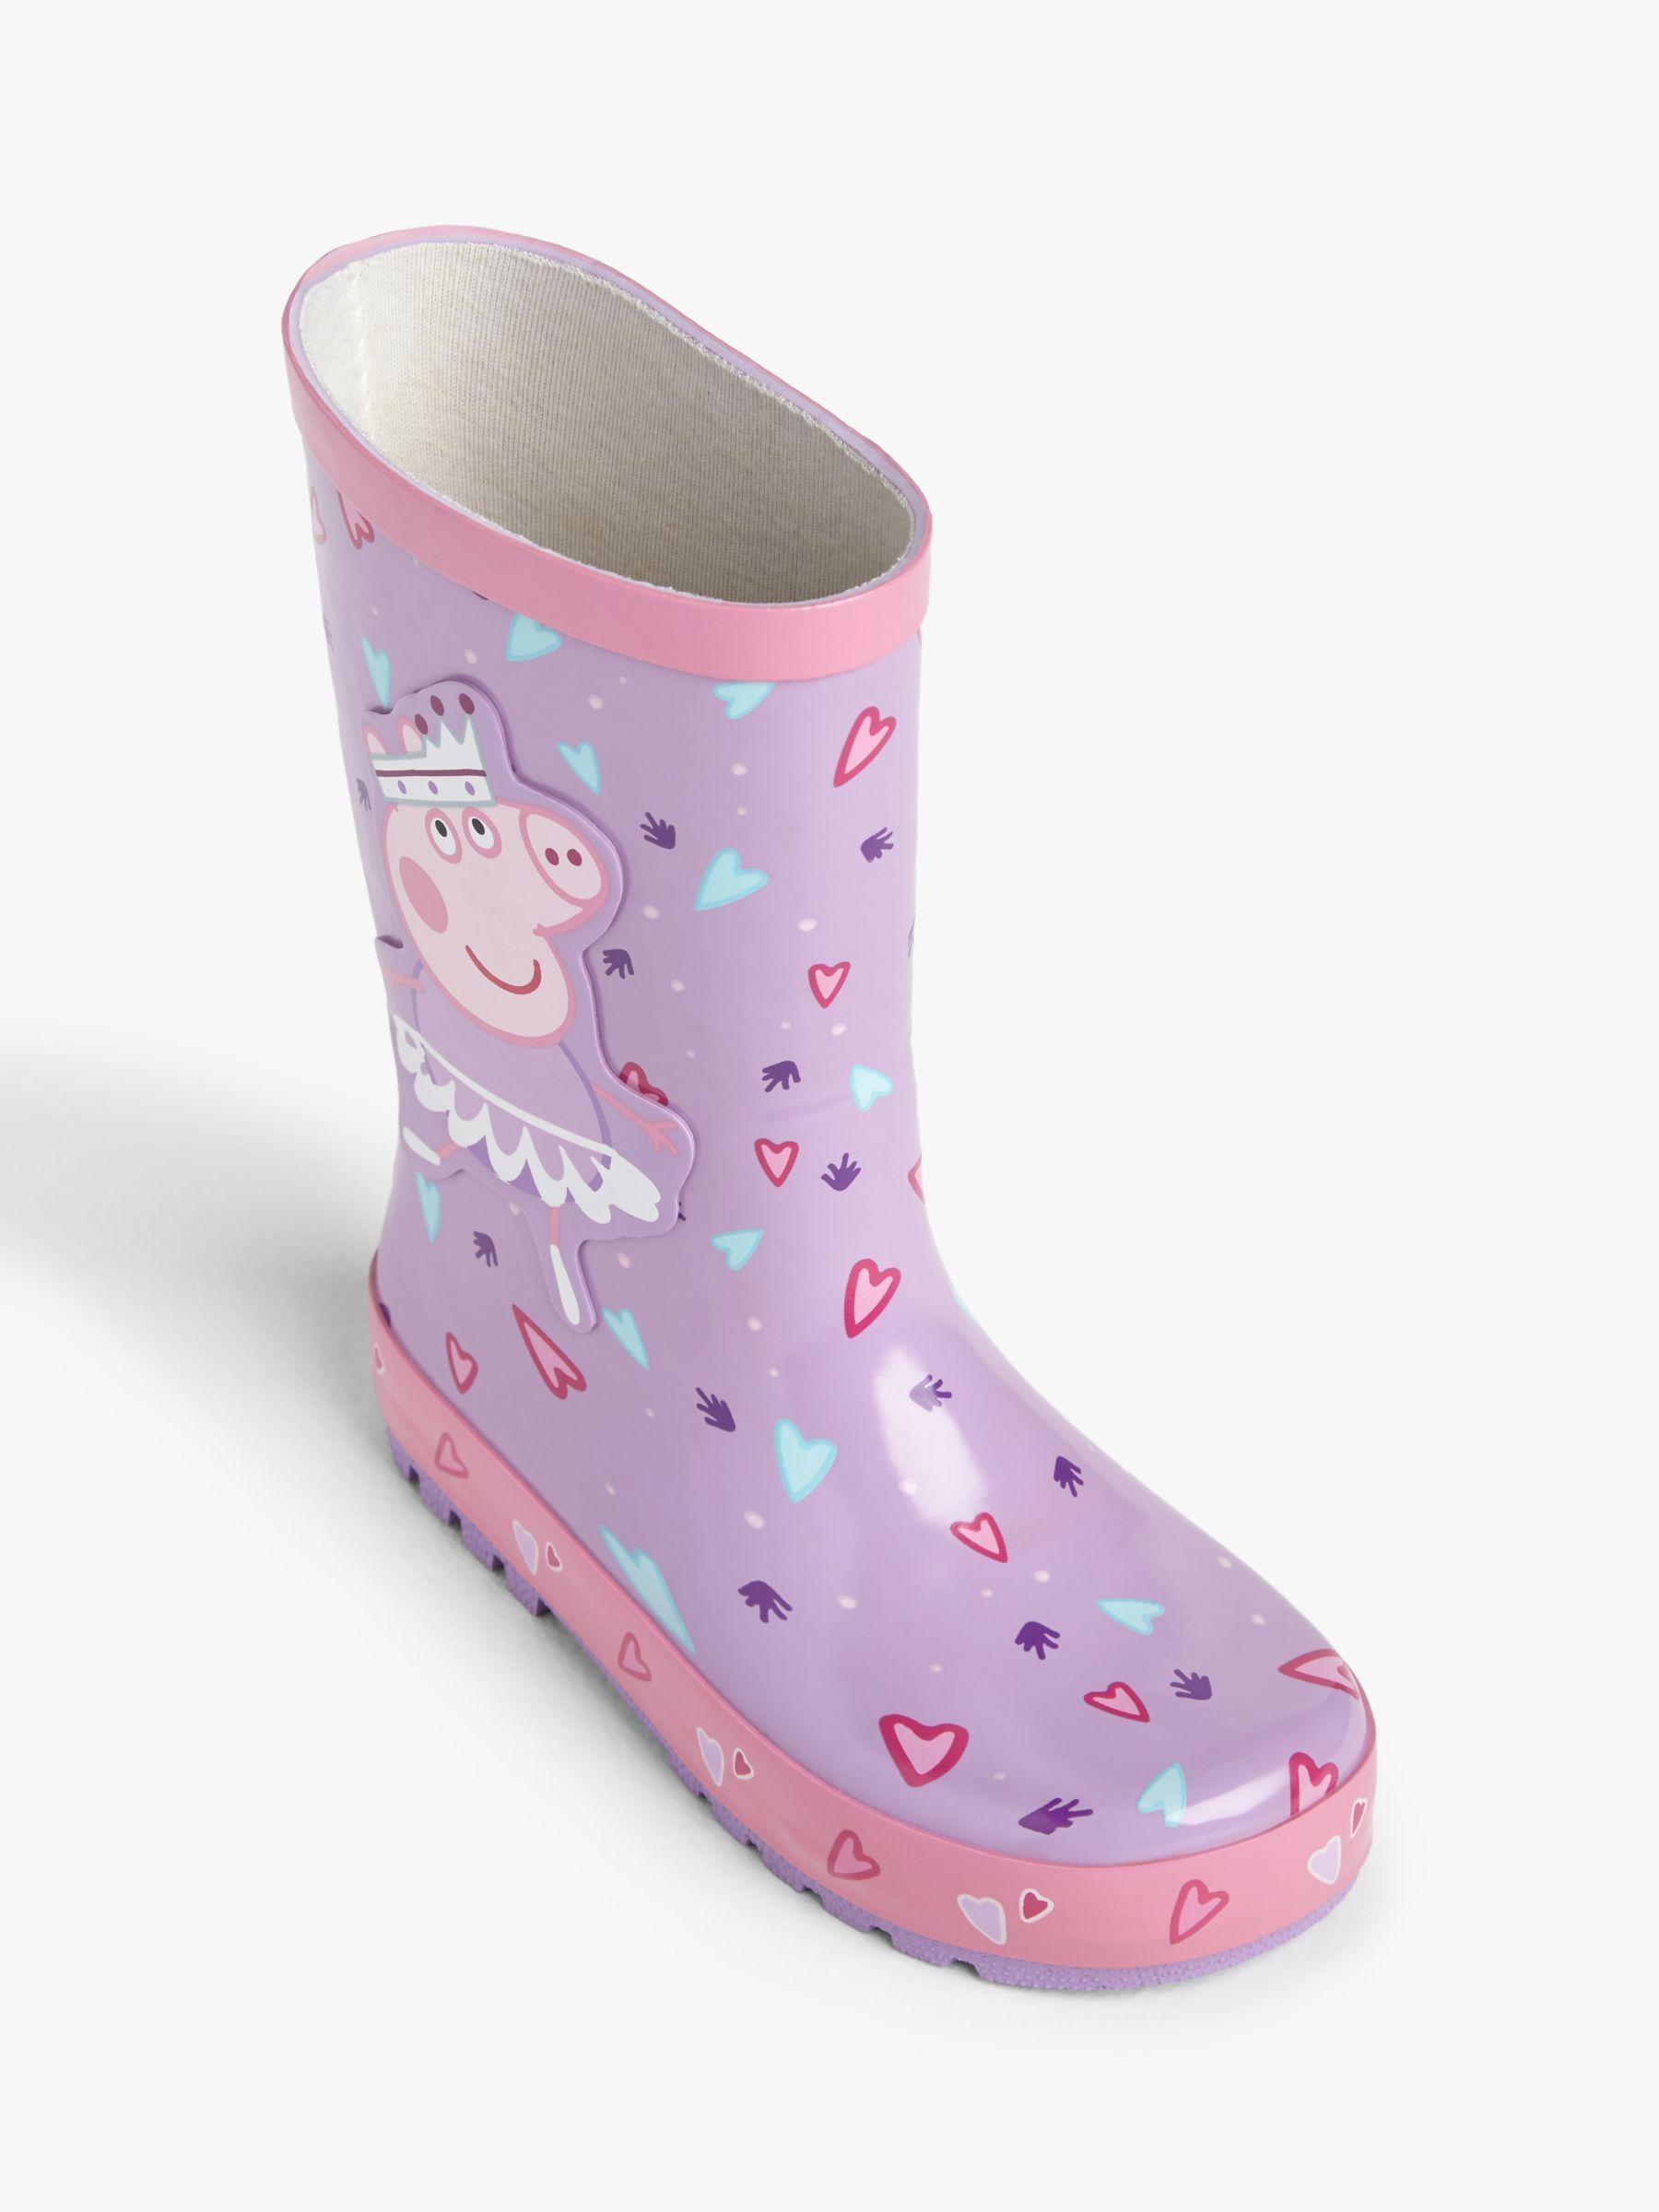 Kids PVC Anti-Slip Rain Boots Shoes Wellington Waterproof Easy Slip On Children